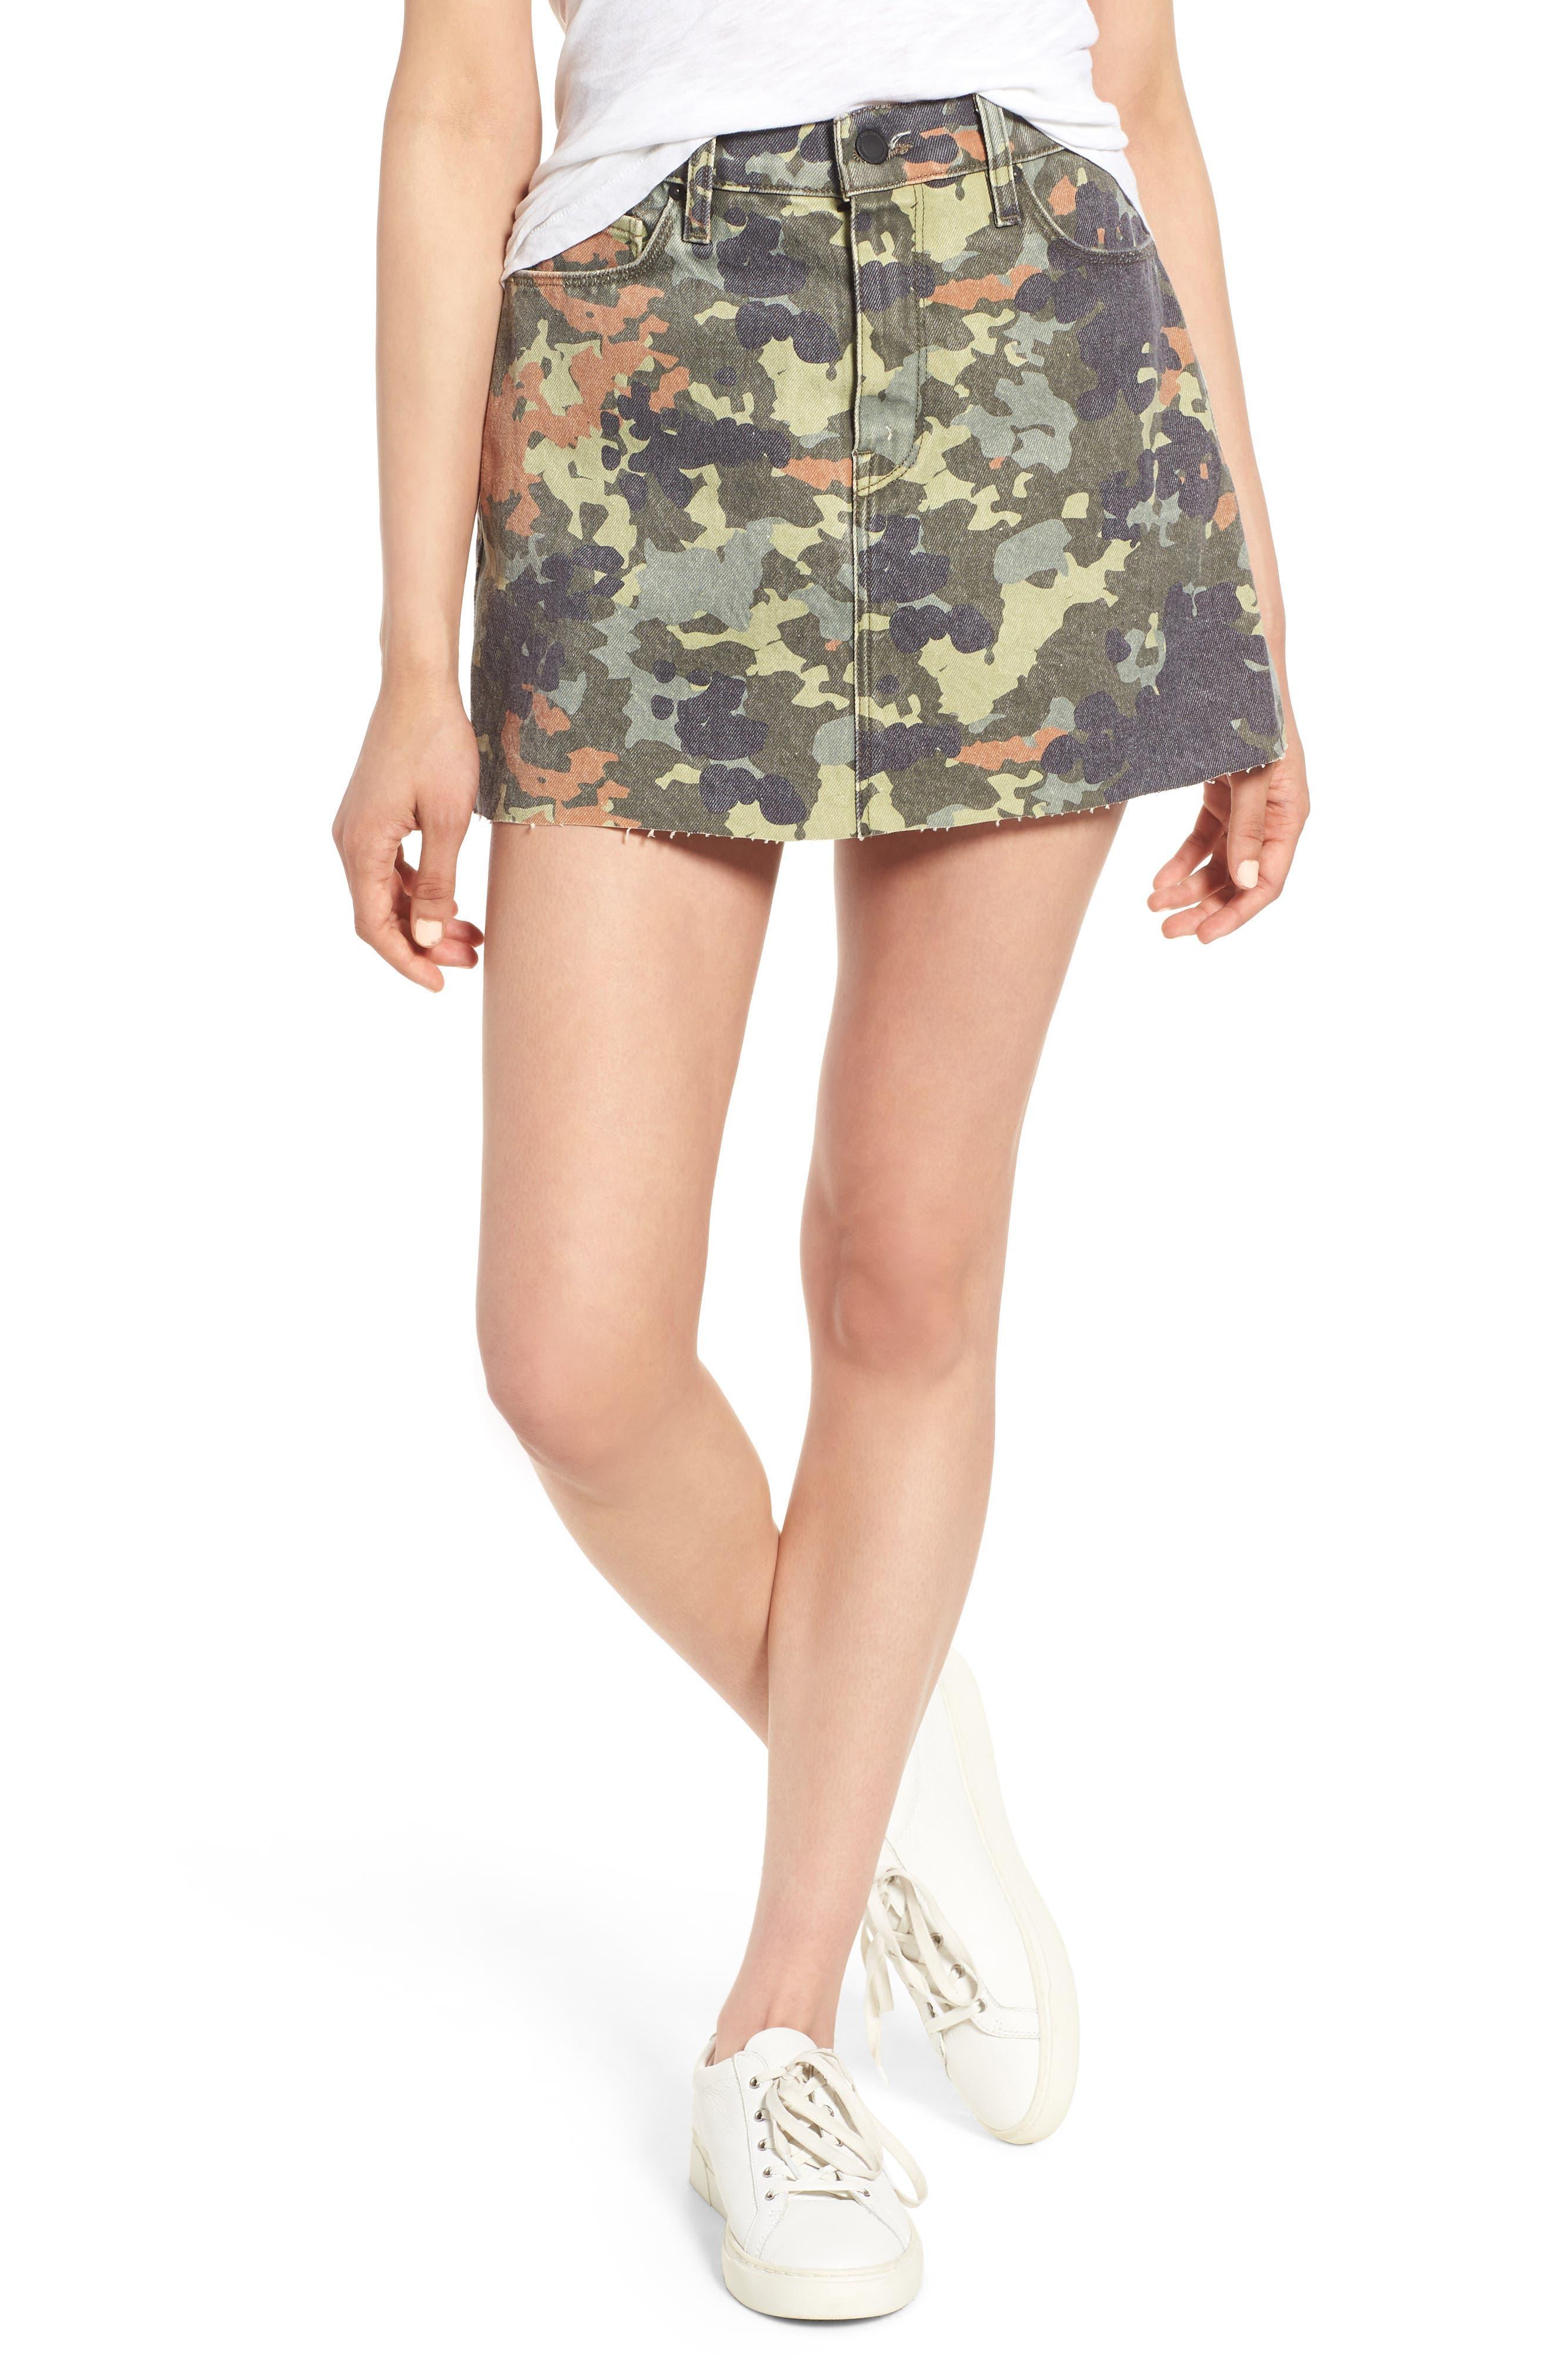 Hudson Jeans The Viper Camo Cutoff Denim Miniskirt, Green